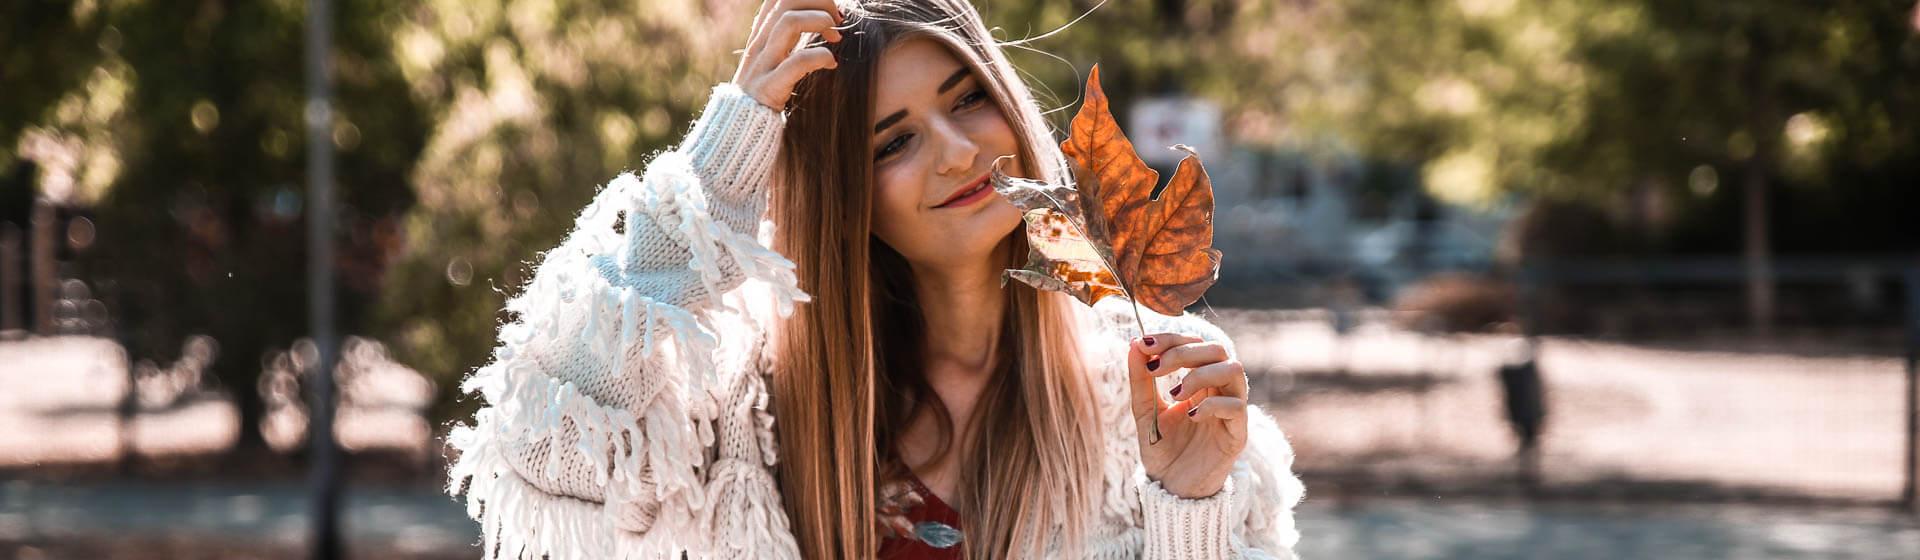 Farbenfrohes Outfit im Herbst kombinieren